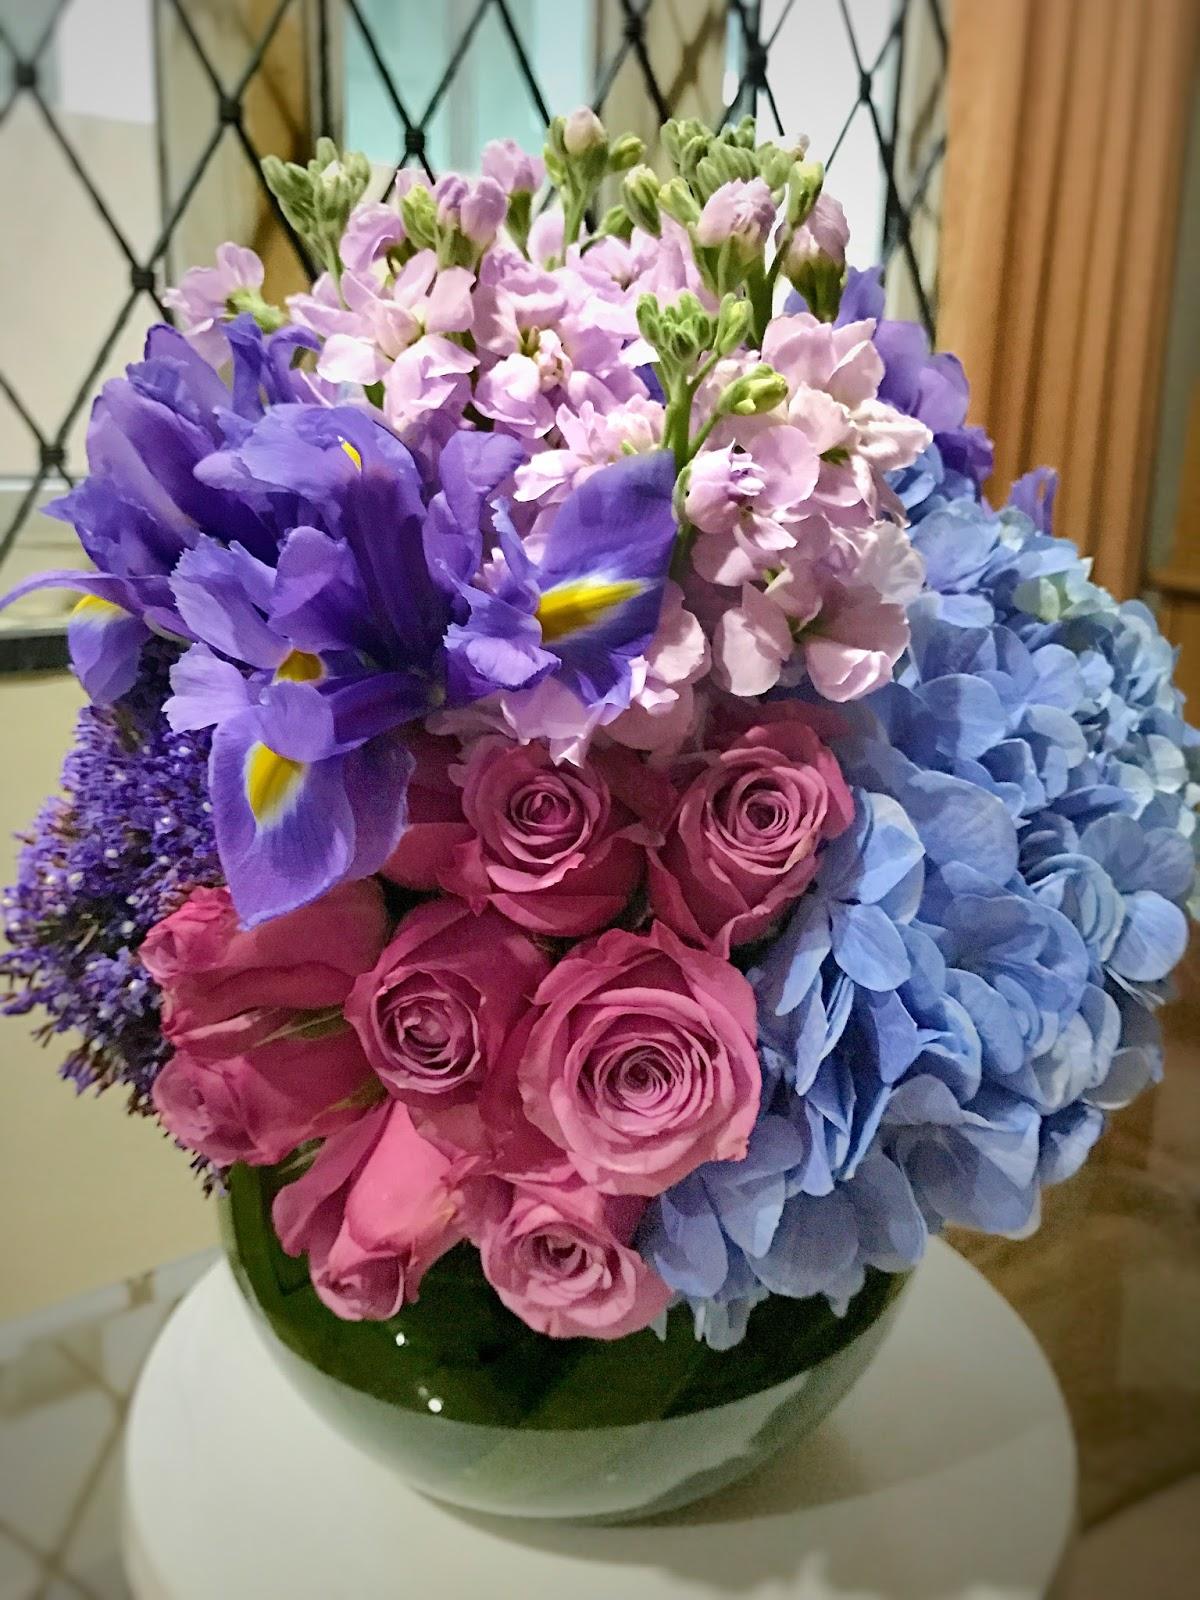 Little flower hut beautiful flowers any day sherbakes little flower hut beautiful flowers any day izmirmasajfo